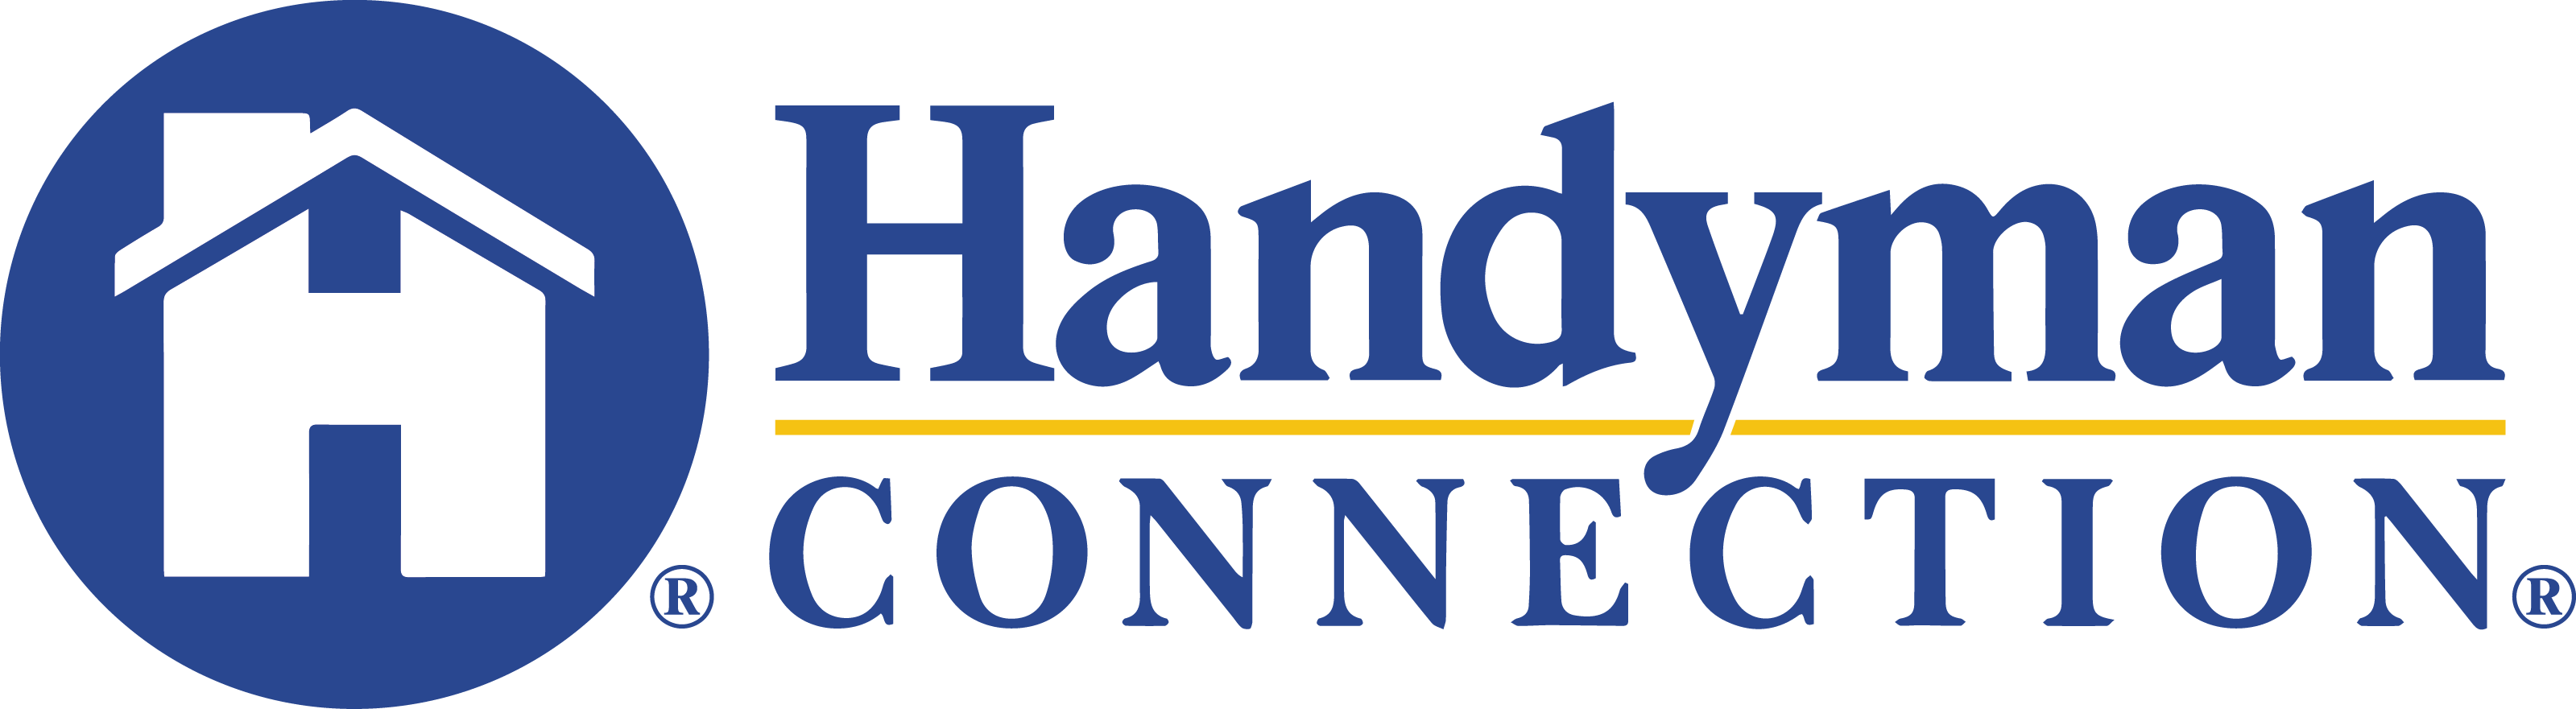 Handyman Connection of Colorado Springs, CO